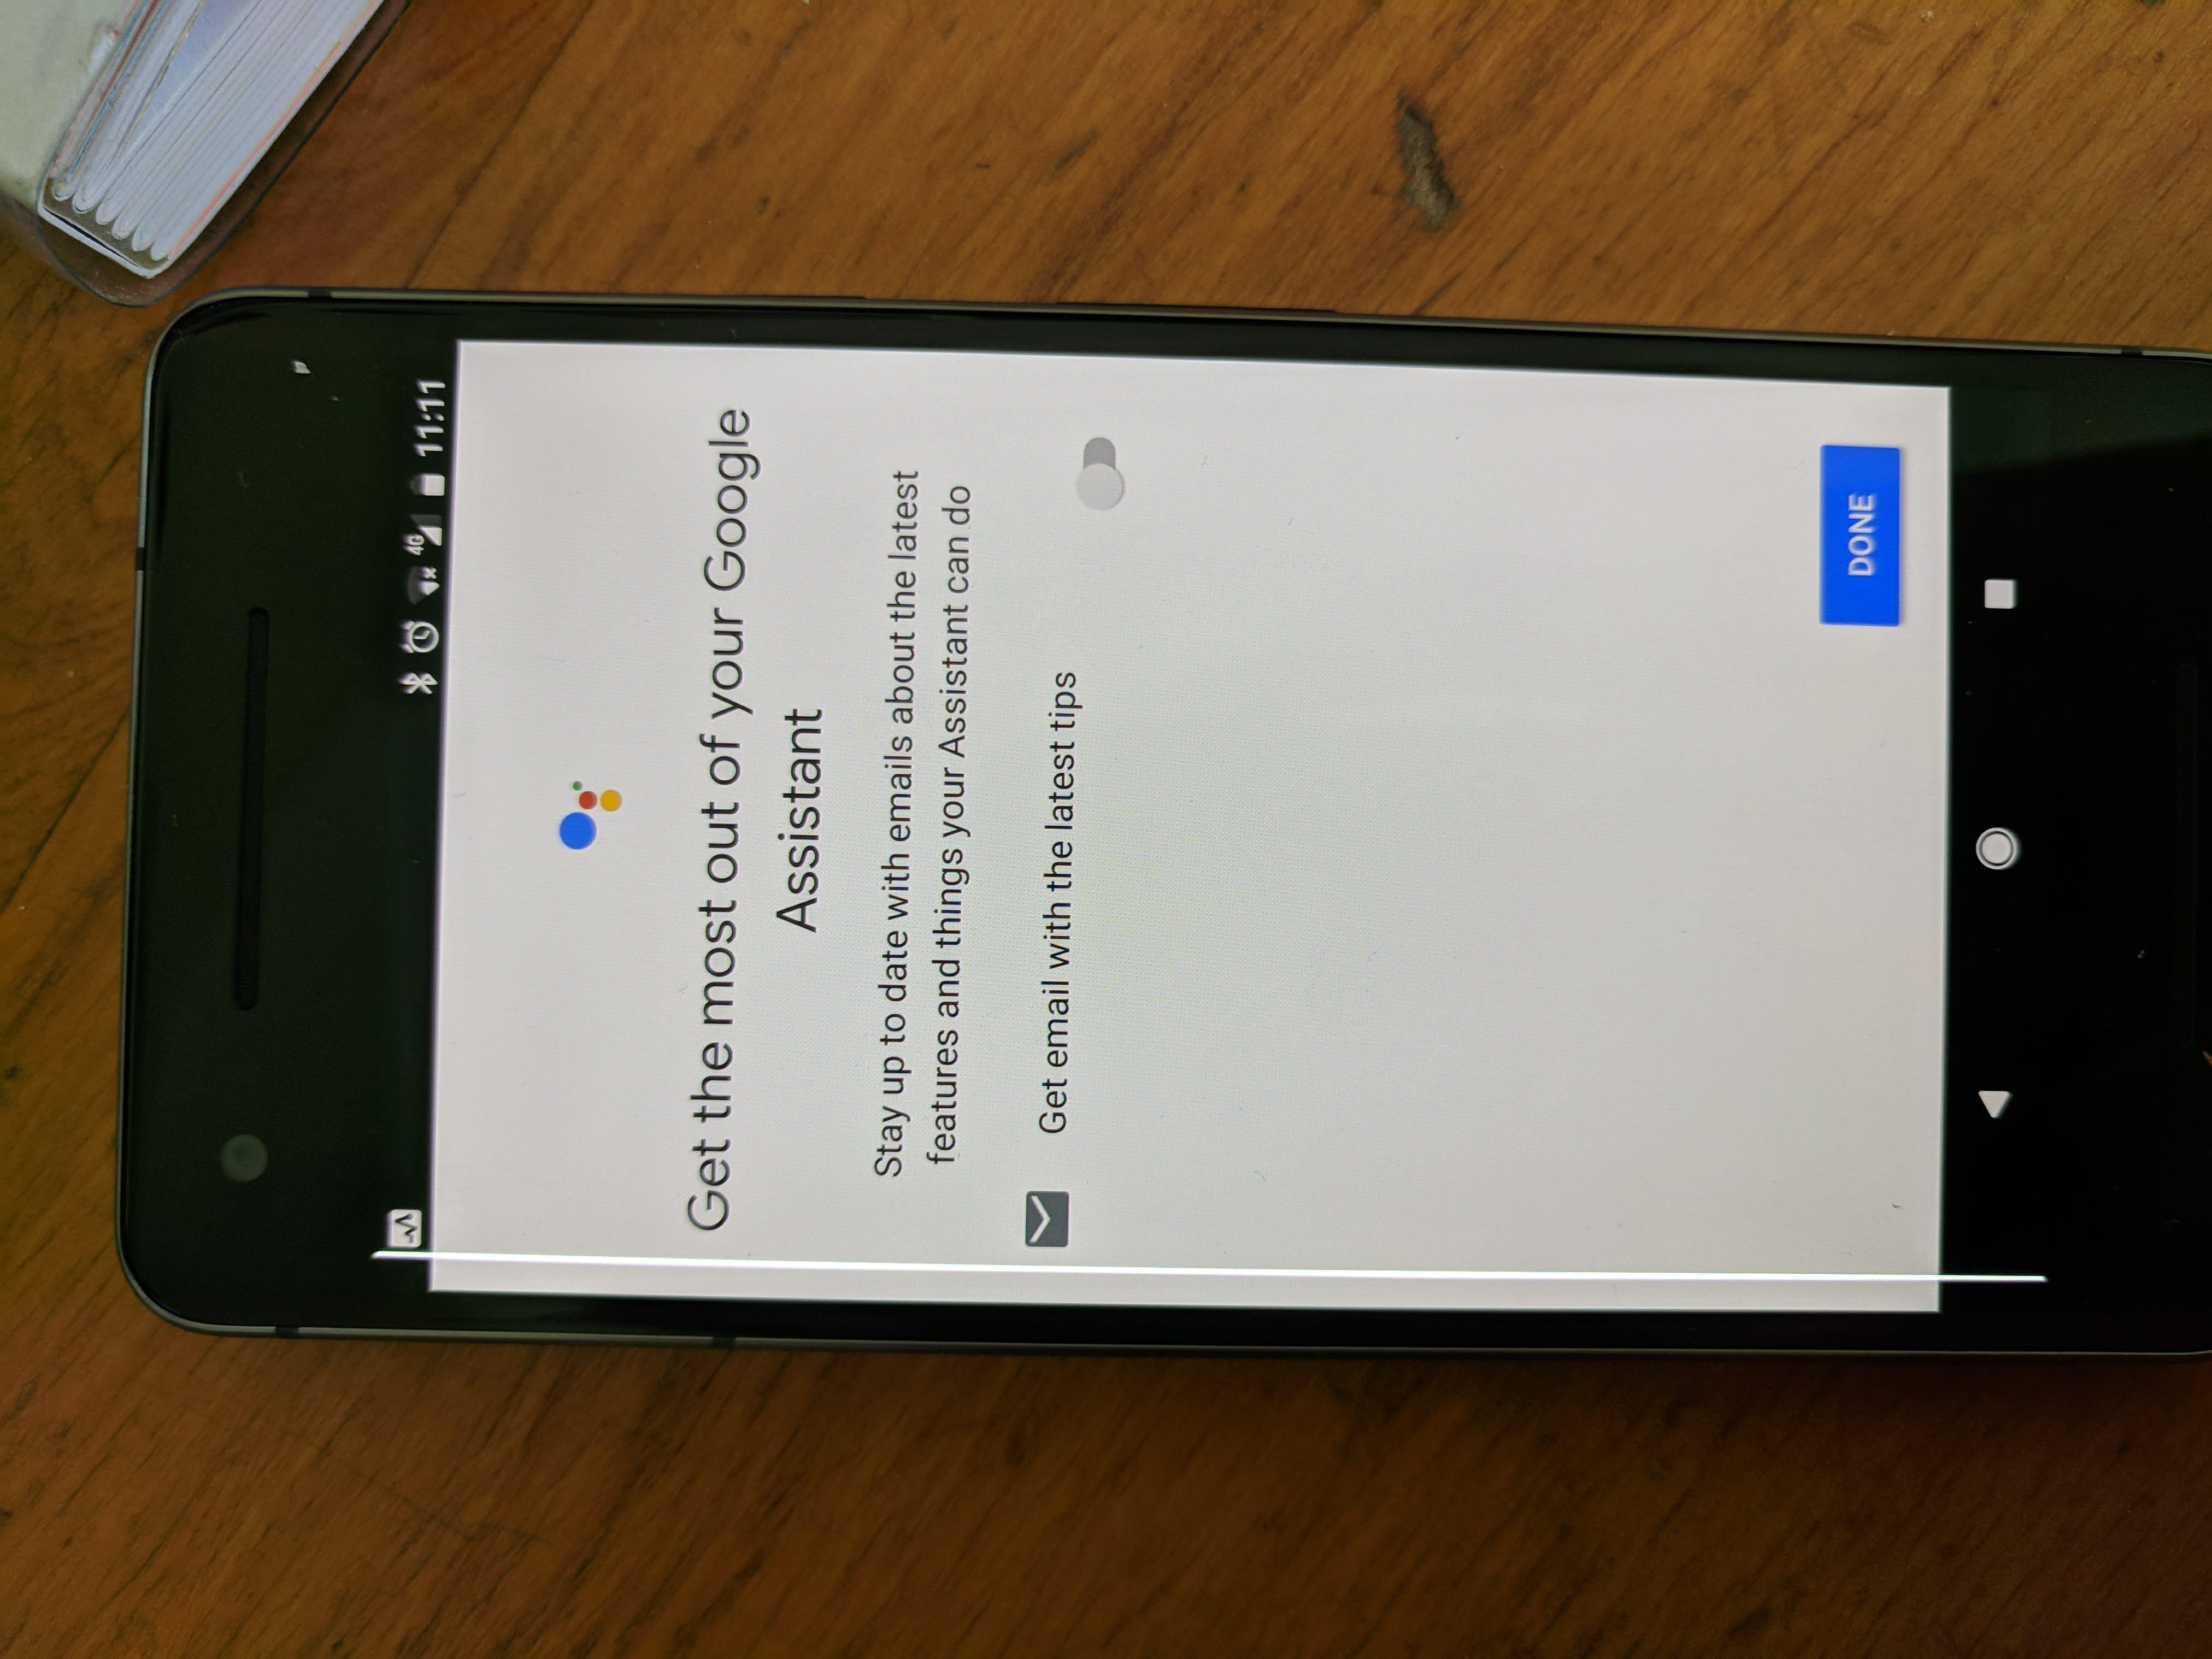 White Line on Pixel 2 screen - Pixel Phone Help